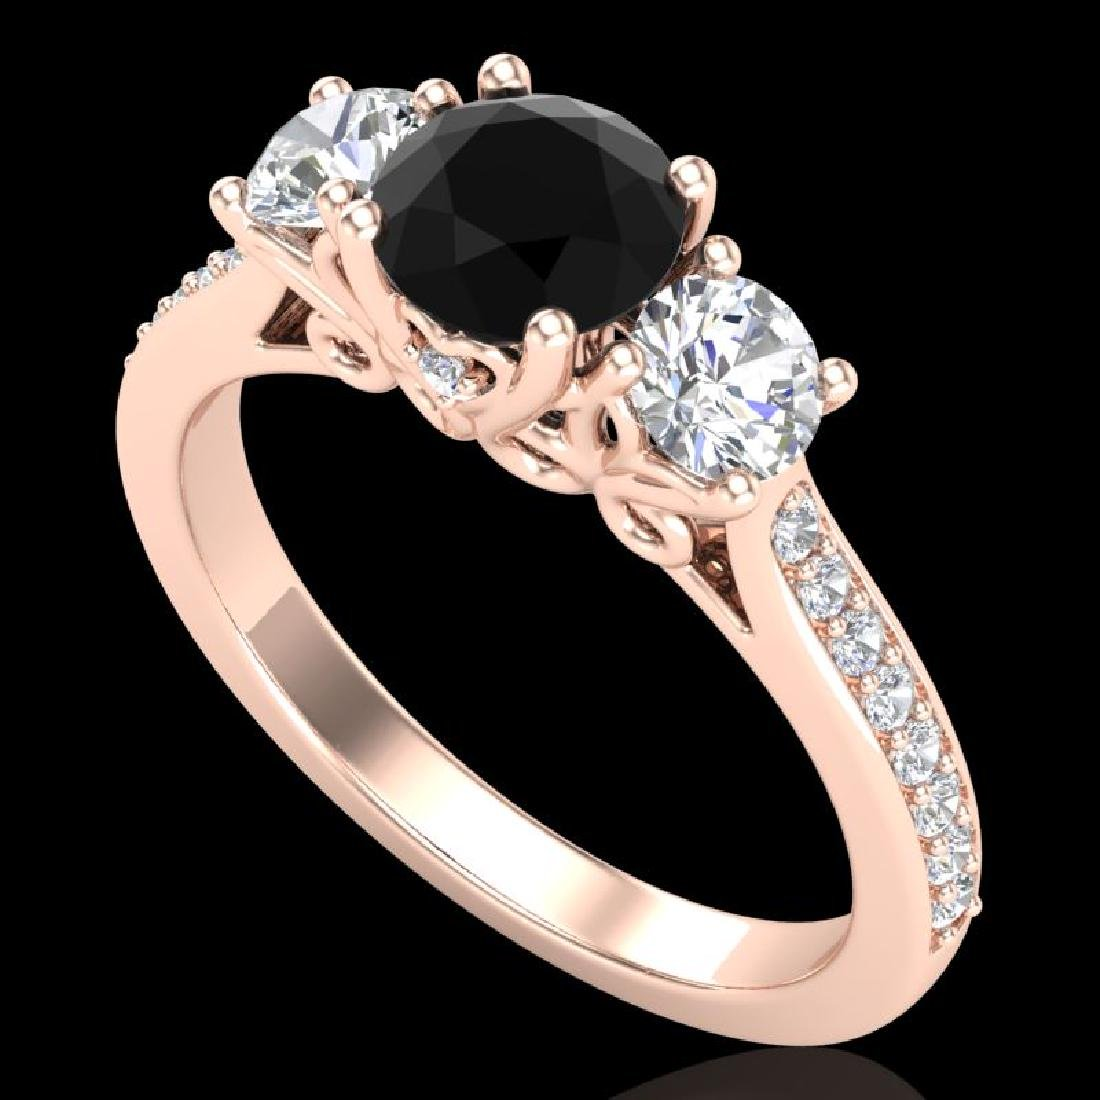 1.67 CTW Fancy Black Diamond Solitaire Art Deco 3 Stone